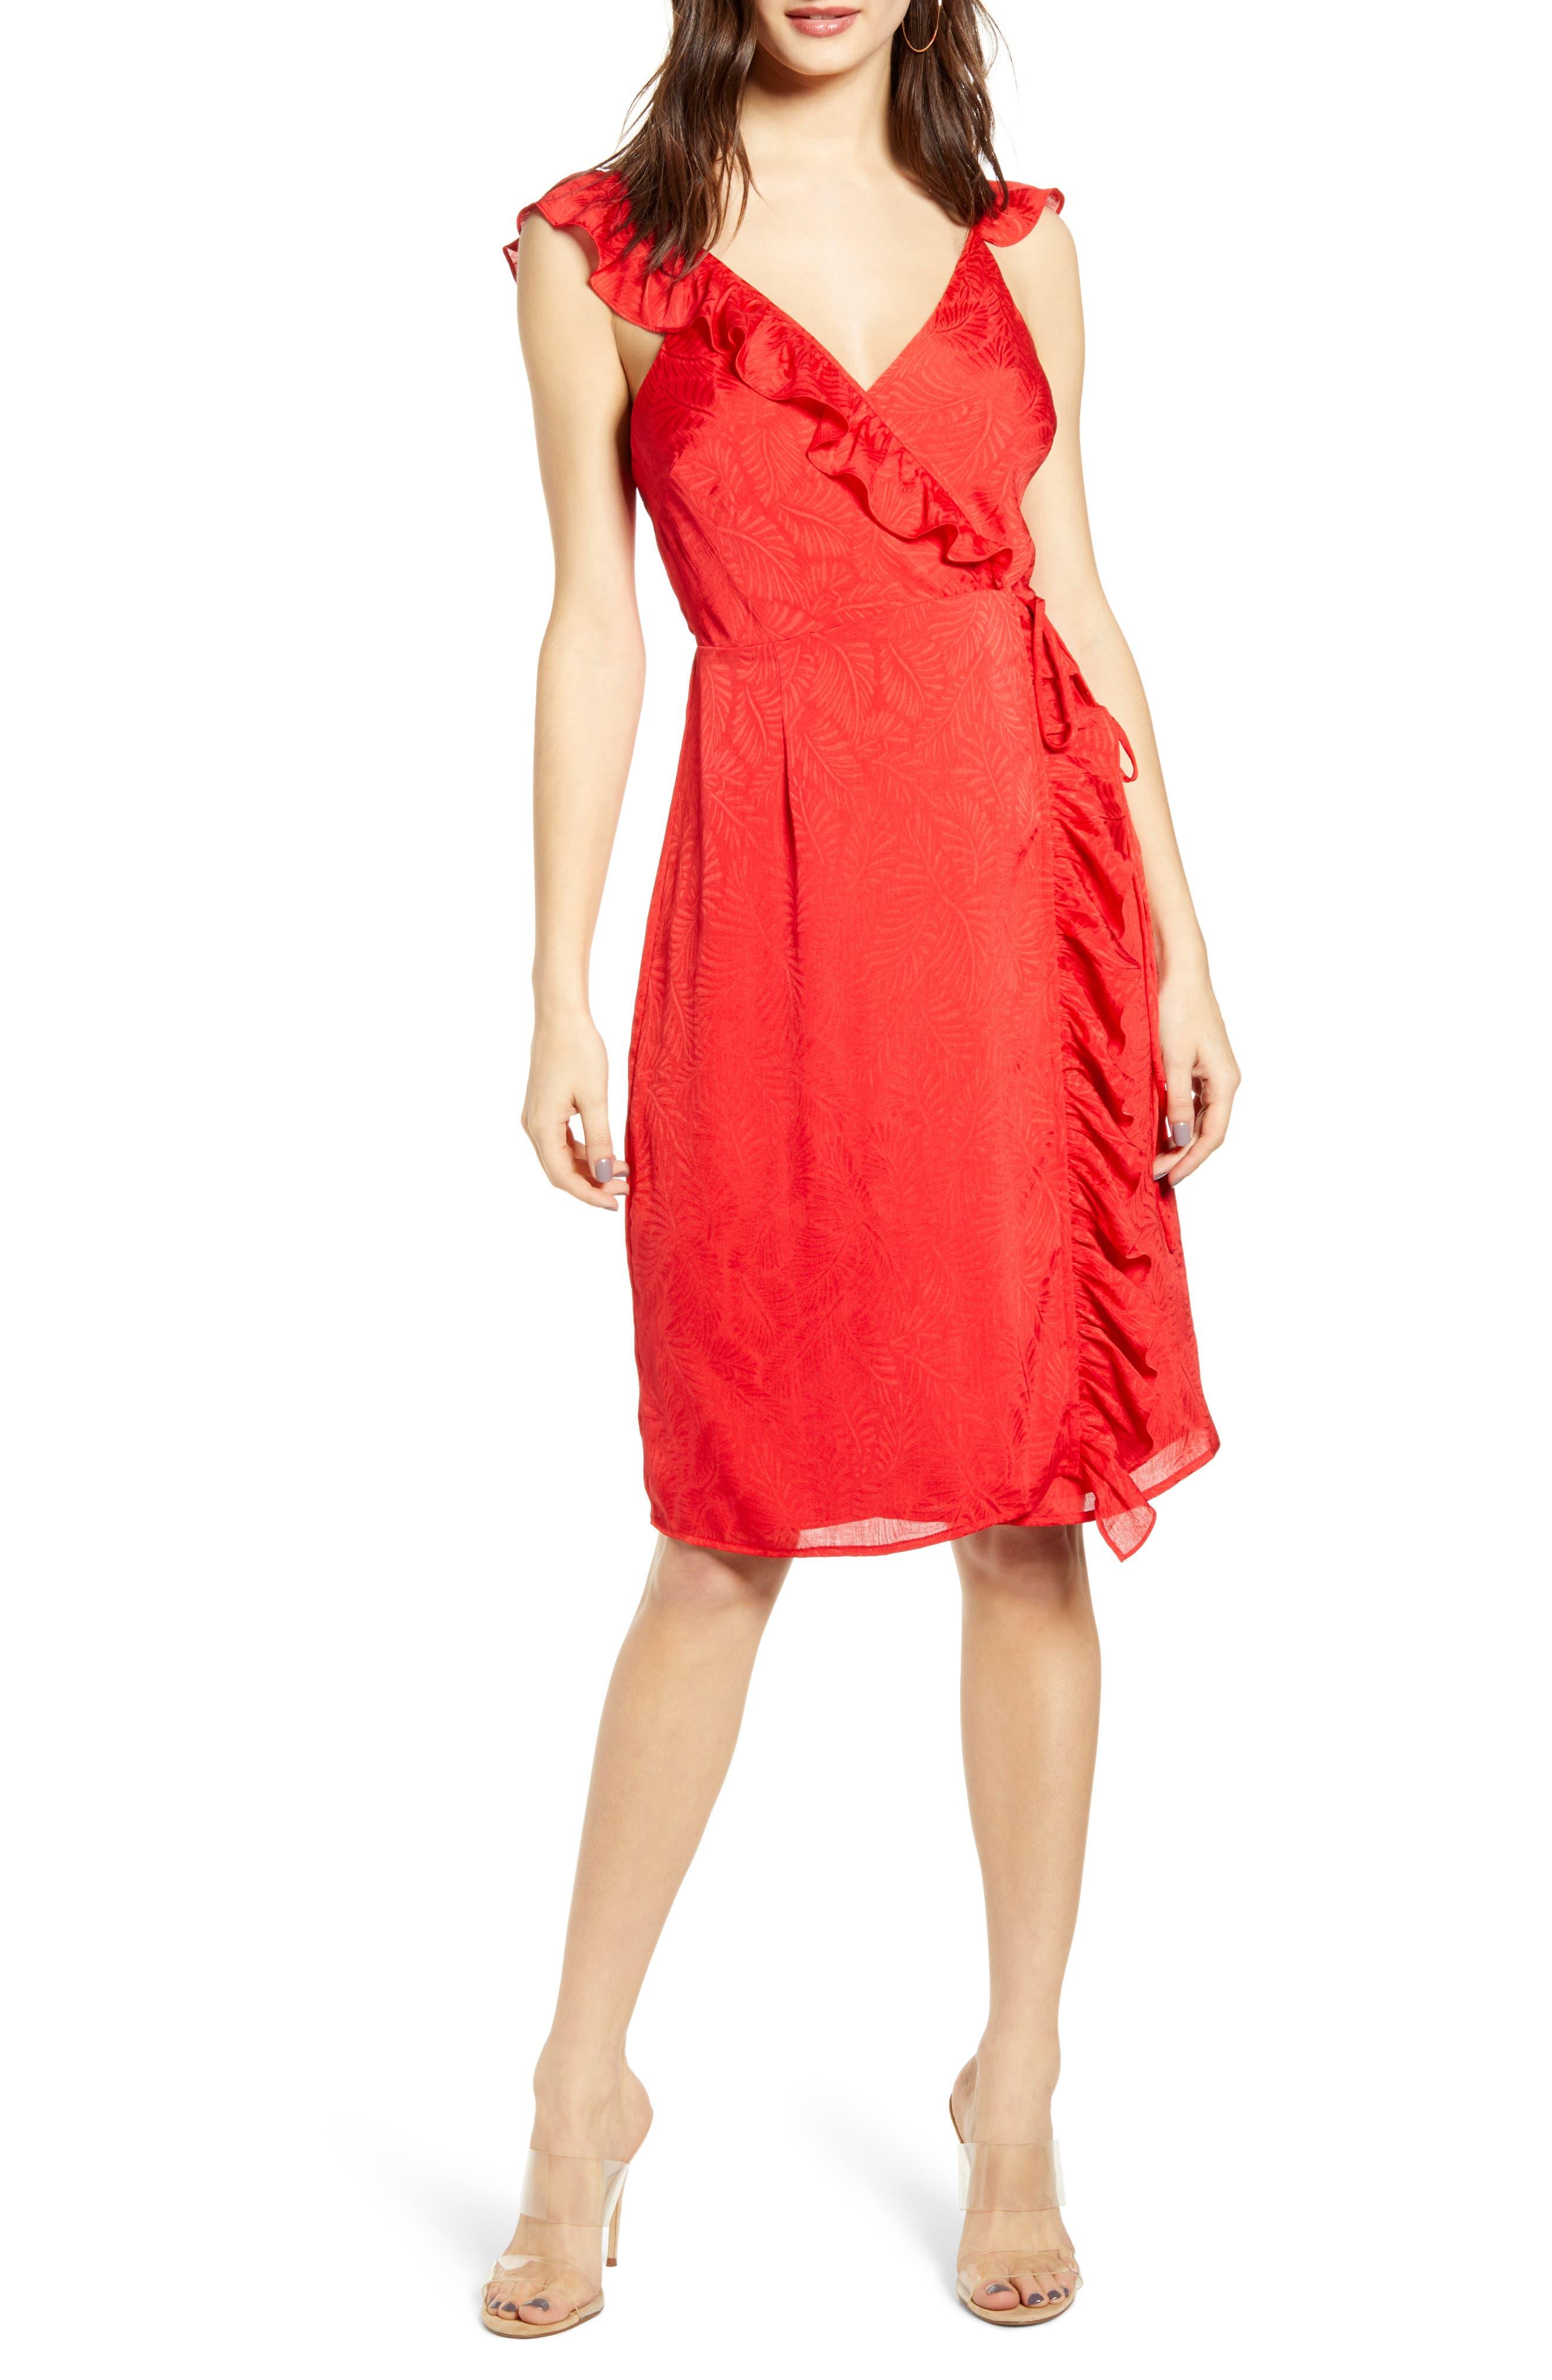 4Si3Nna Sleeveless Ruffle Wrap Dress, Red